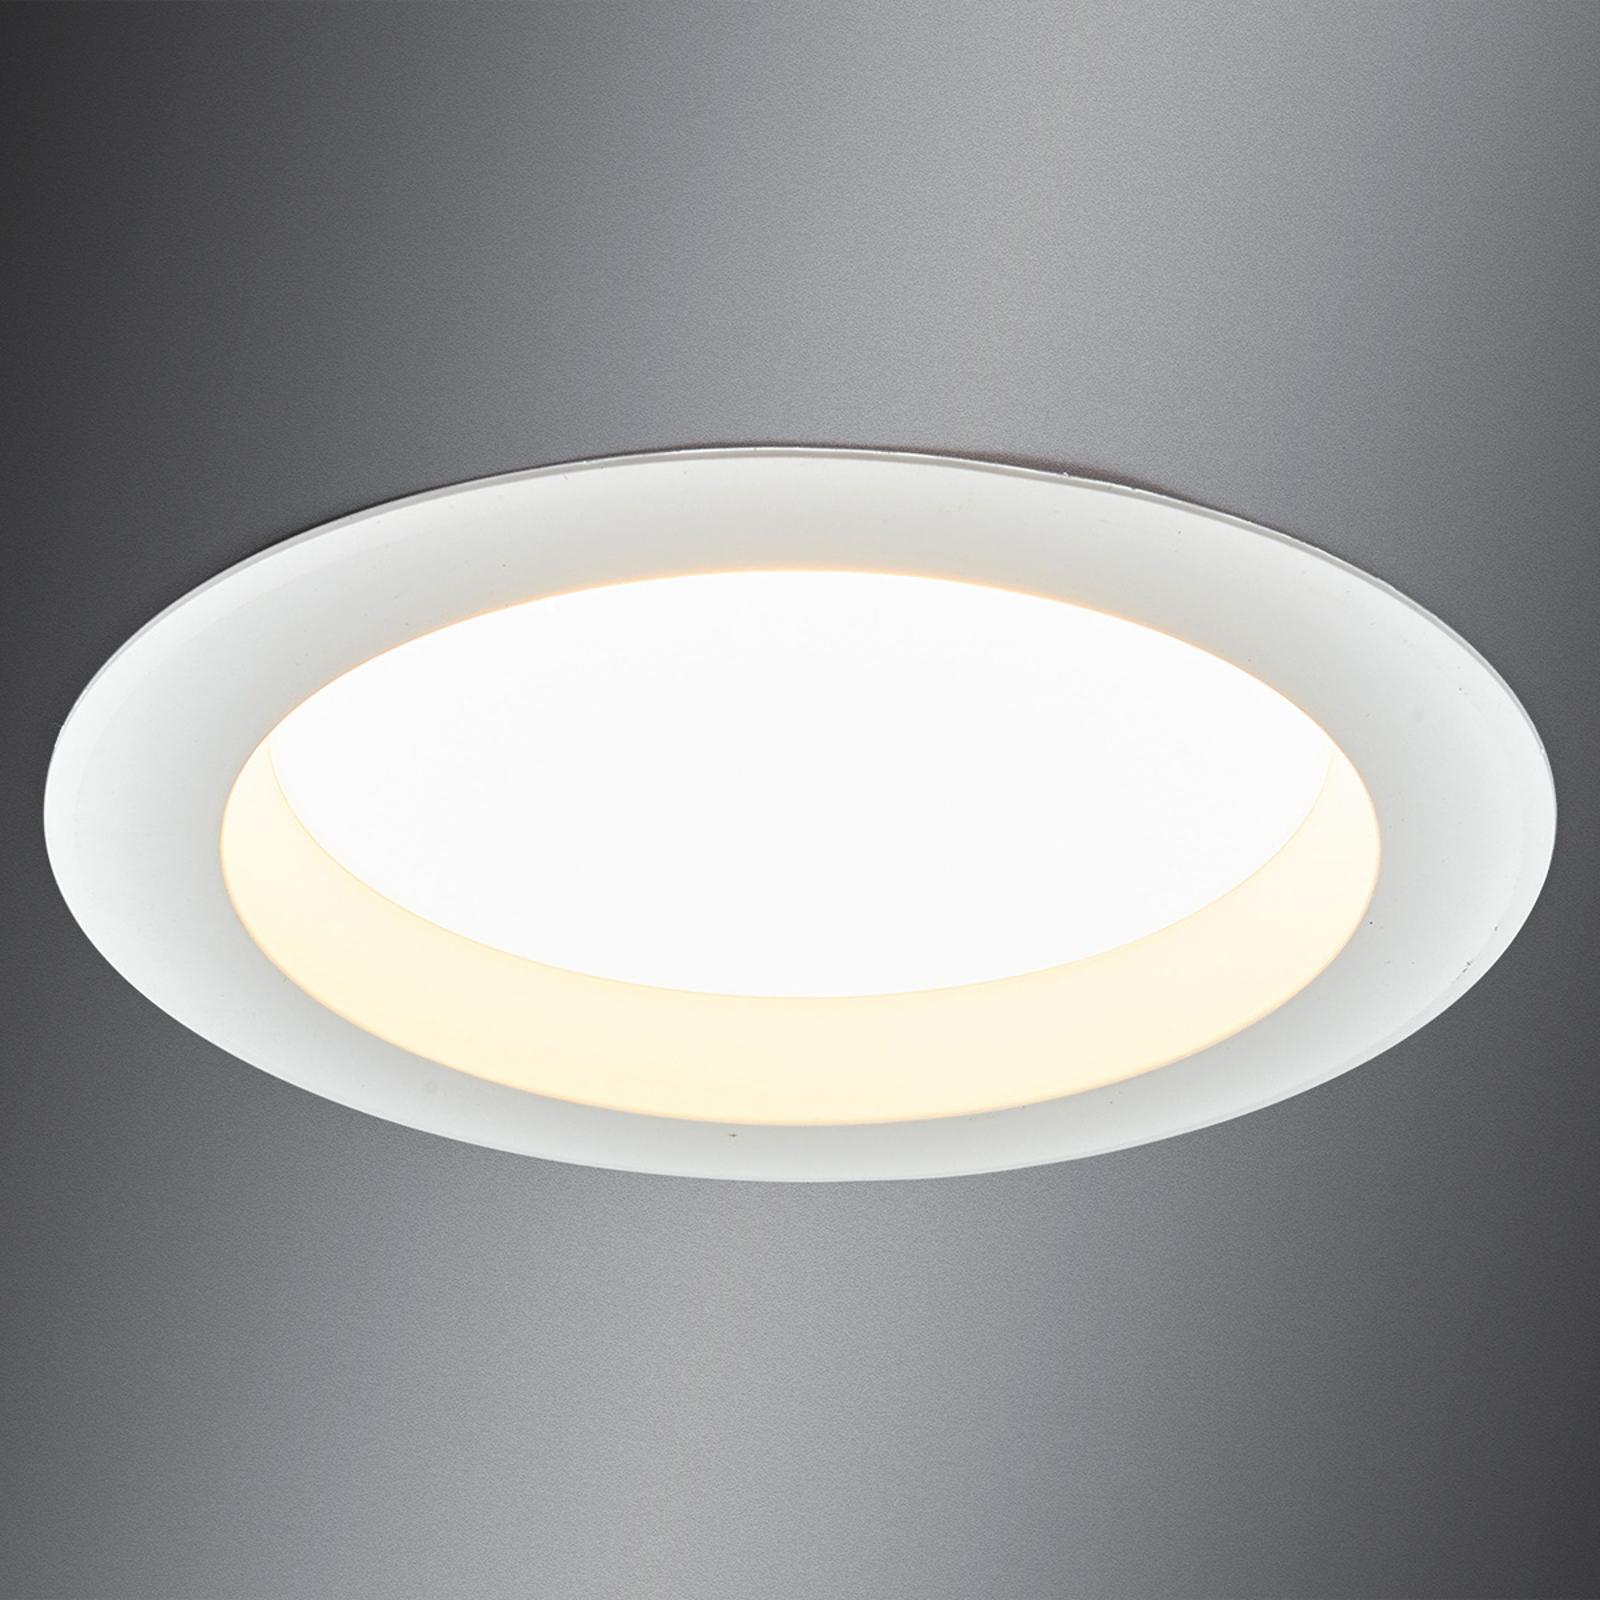 Potente downlight rotondo LED Arian, 17,4 cm 15W